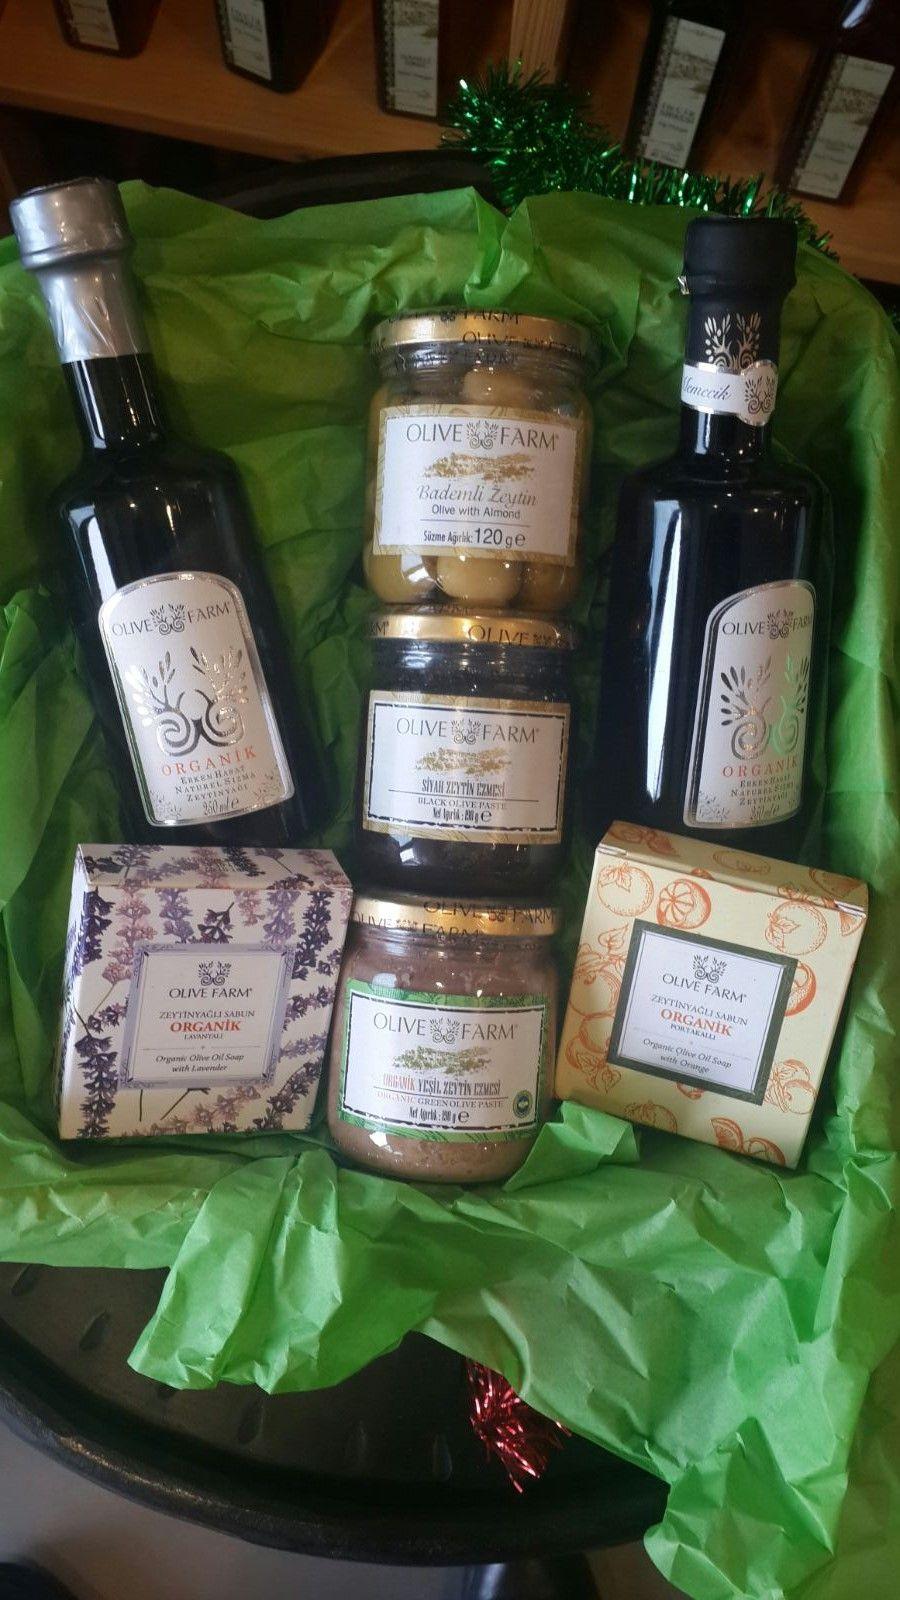 9700 Tl Olive Farm Paket 2 250 Ml Ayvalk Zeytinya Sabun